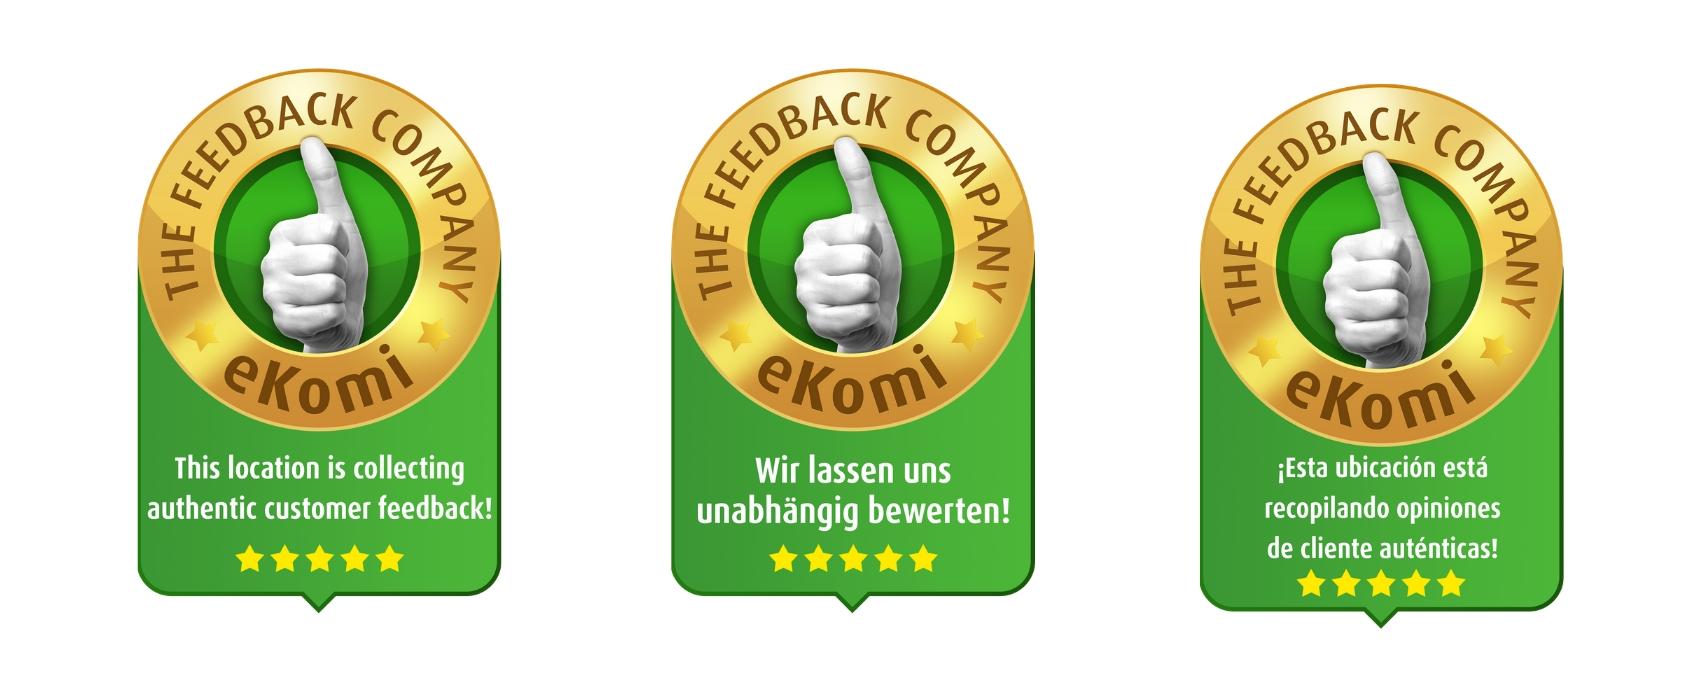 stickers_ekomi_appstore-1573479633.jpg